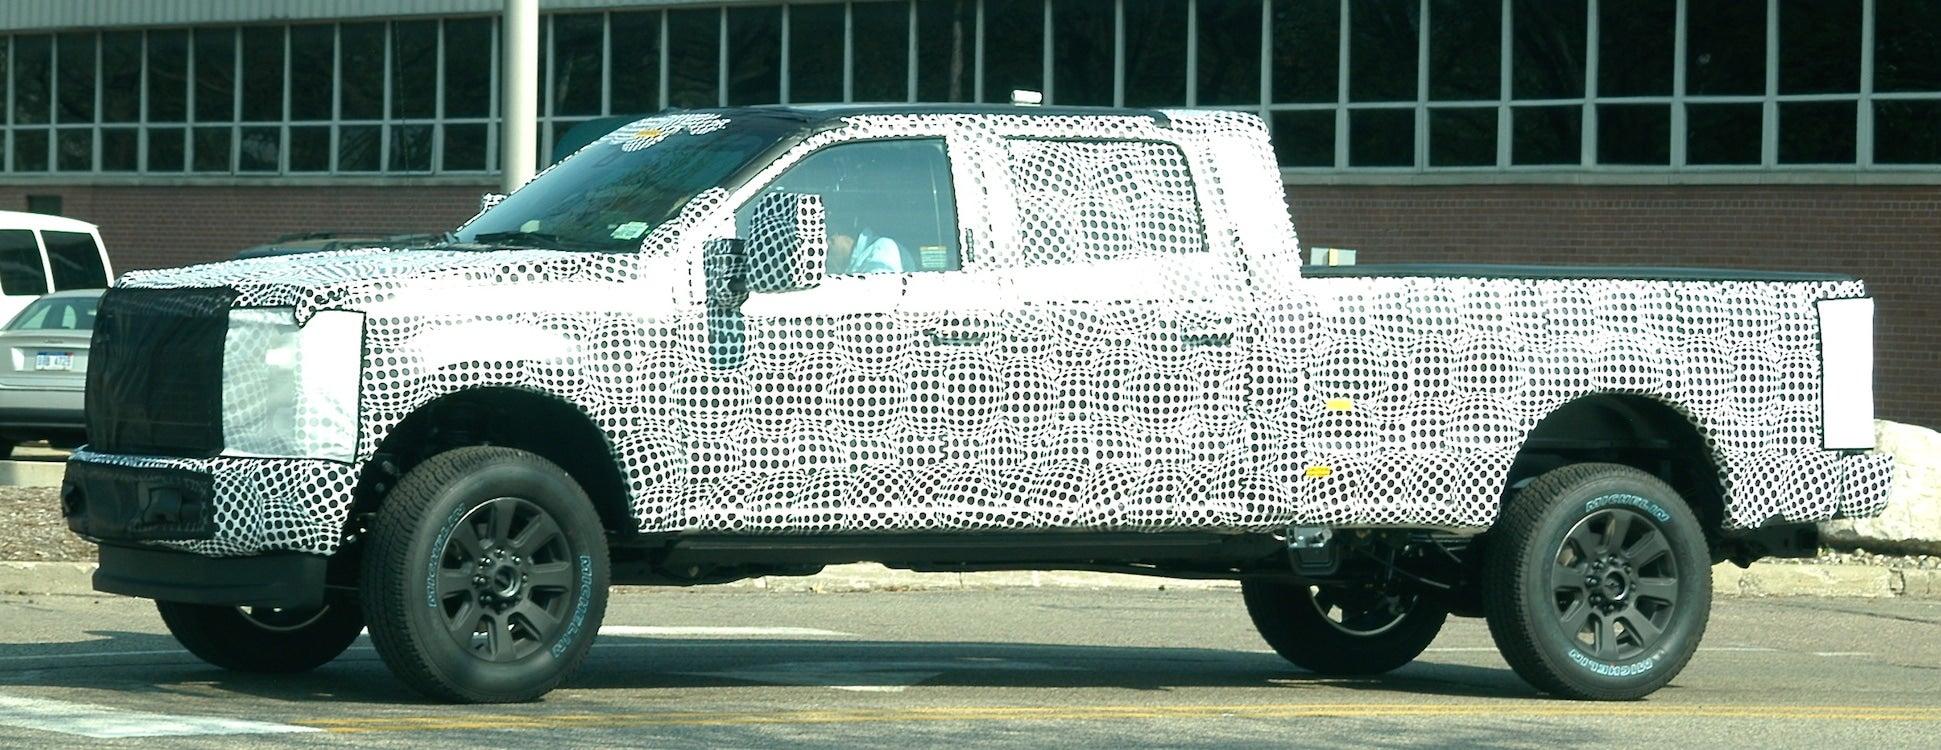 Spy Shots: Ford Super Duty Goes Aluminum, Too